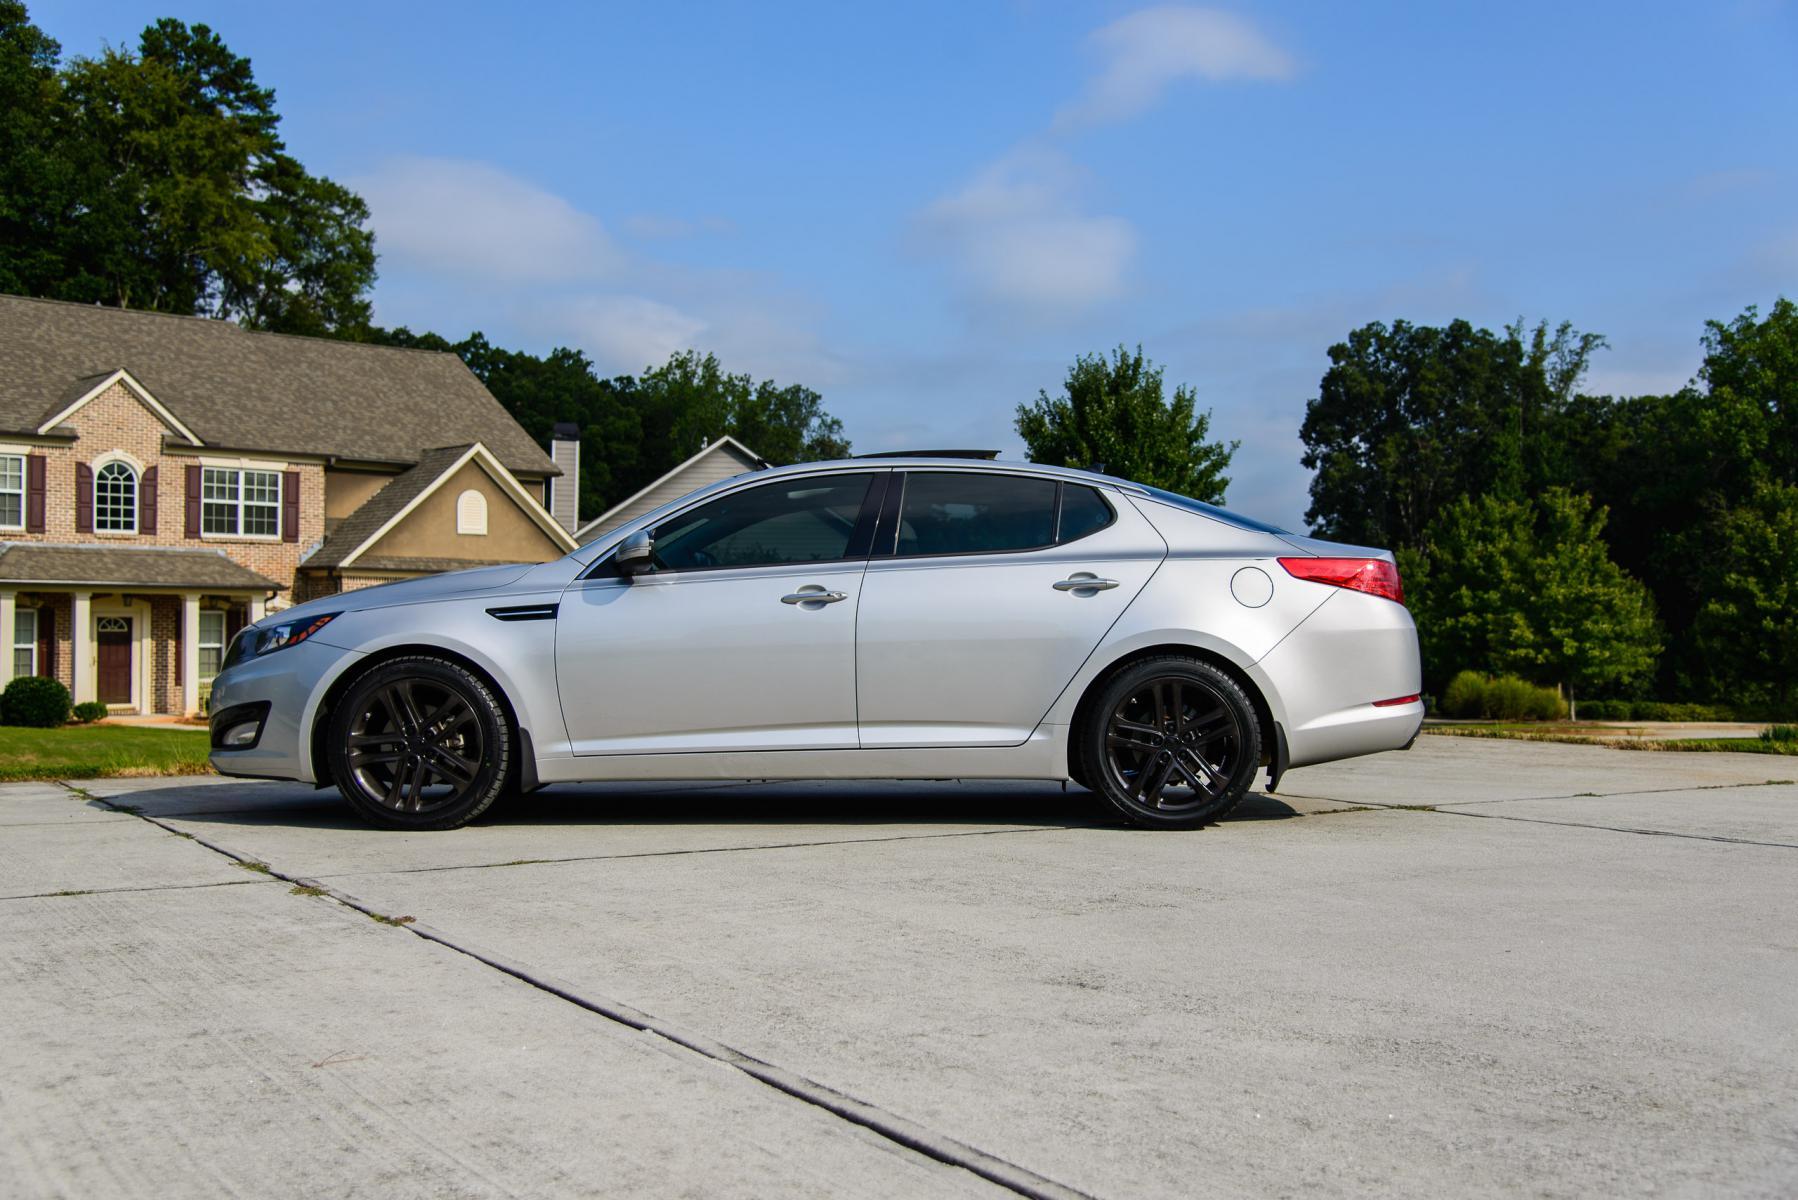 2015 Kia Optima Rims >> [EX] : 2013 EX - SXL wheels powder coated with silver/candy black for Black Chrome